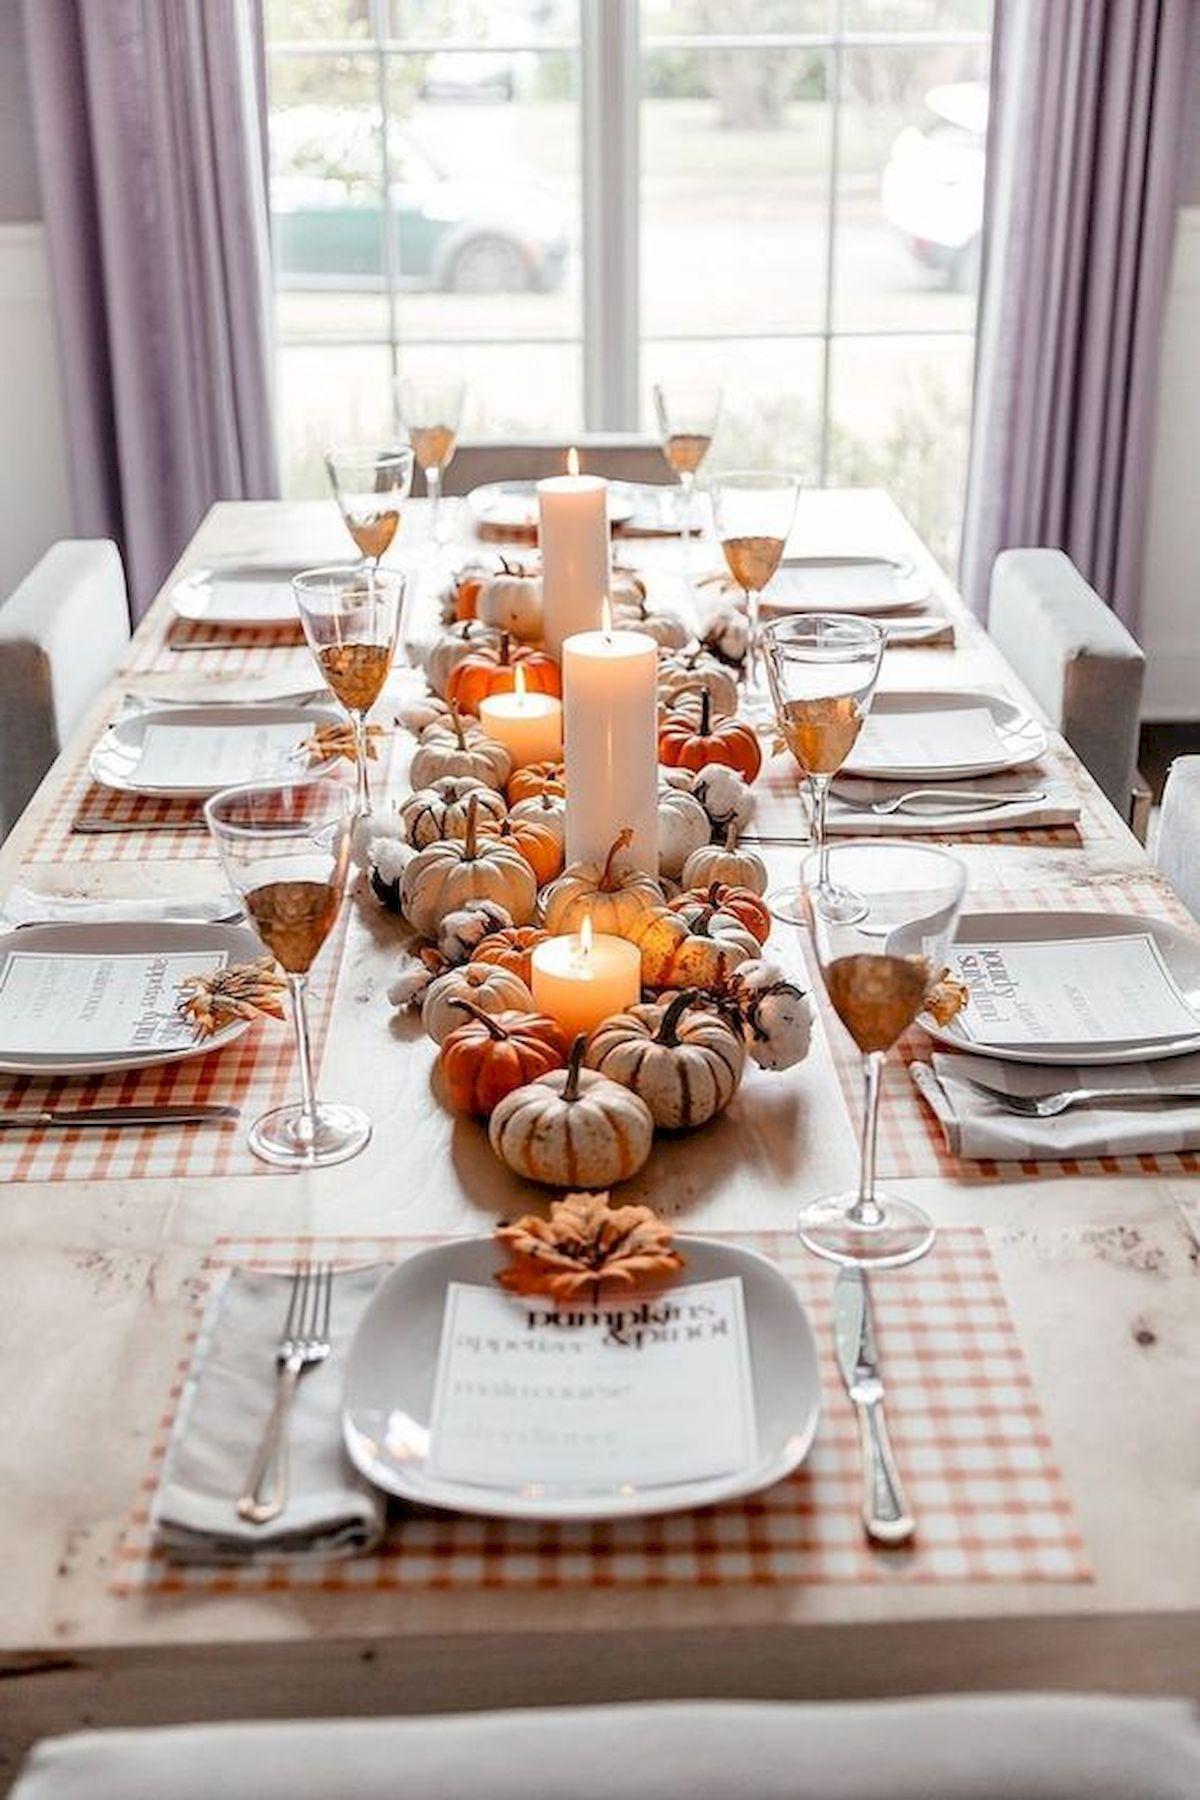 45 Best Tablescape Ideas for Thanksgiving #thanksgivingtablesettings